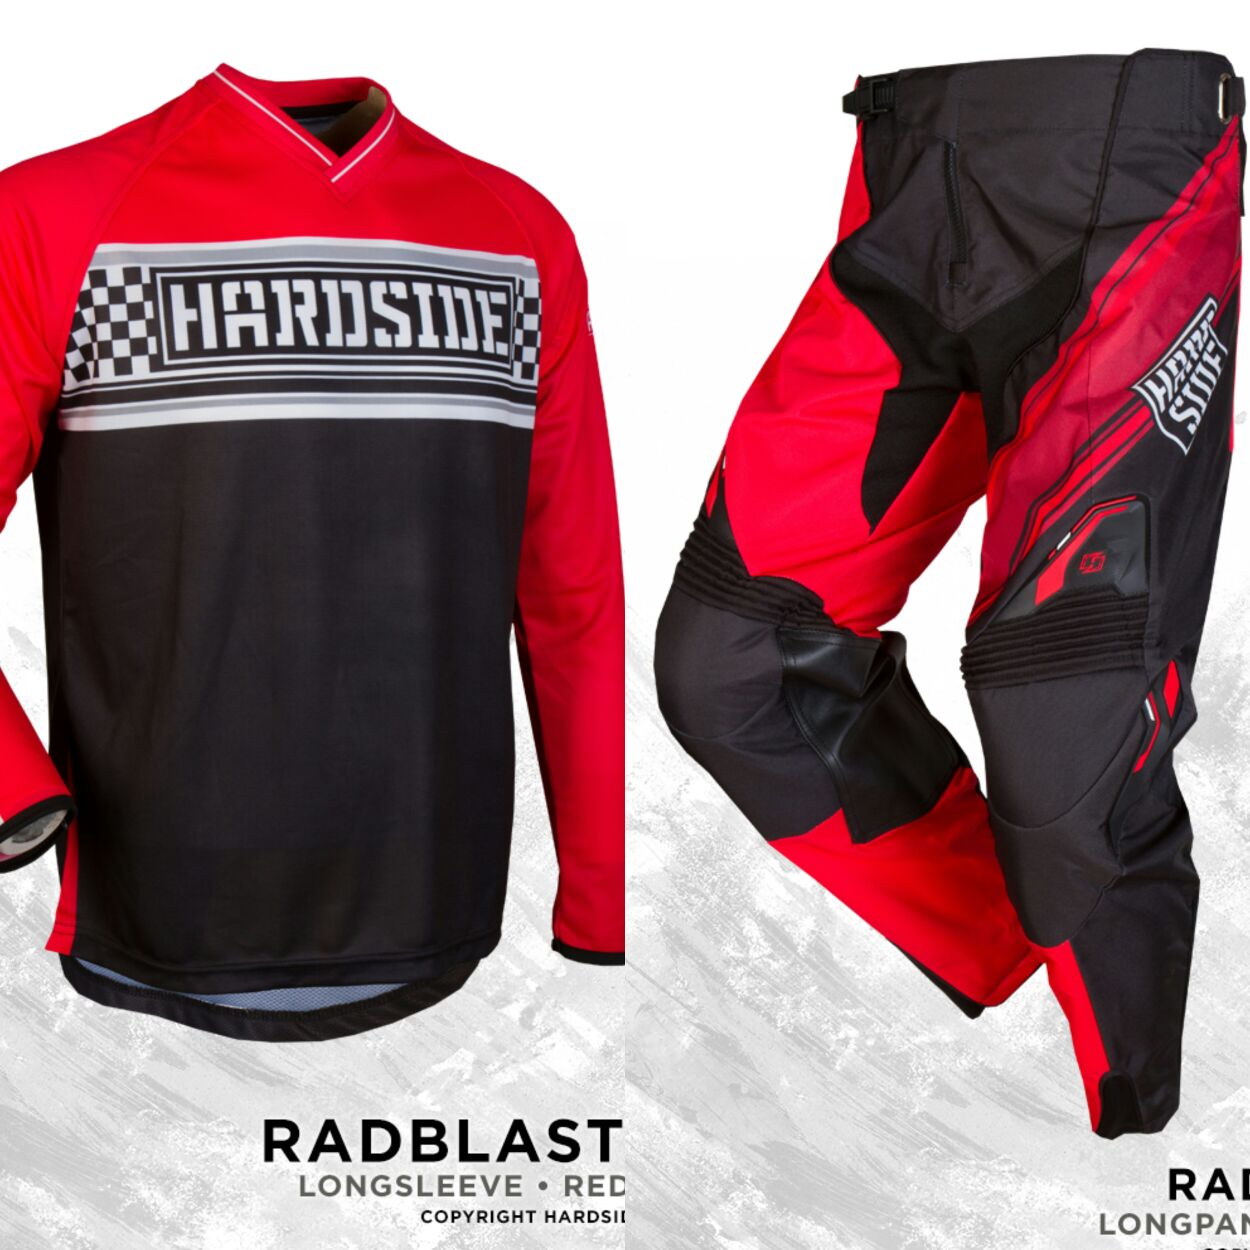 wpid wp 1459923558510 Jual Jersey set merk HARDSIDE Radblast uk 32,34,36,38 Rp 725.000